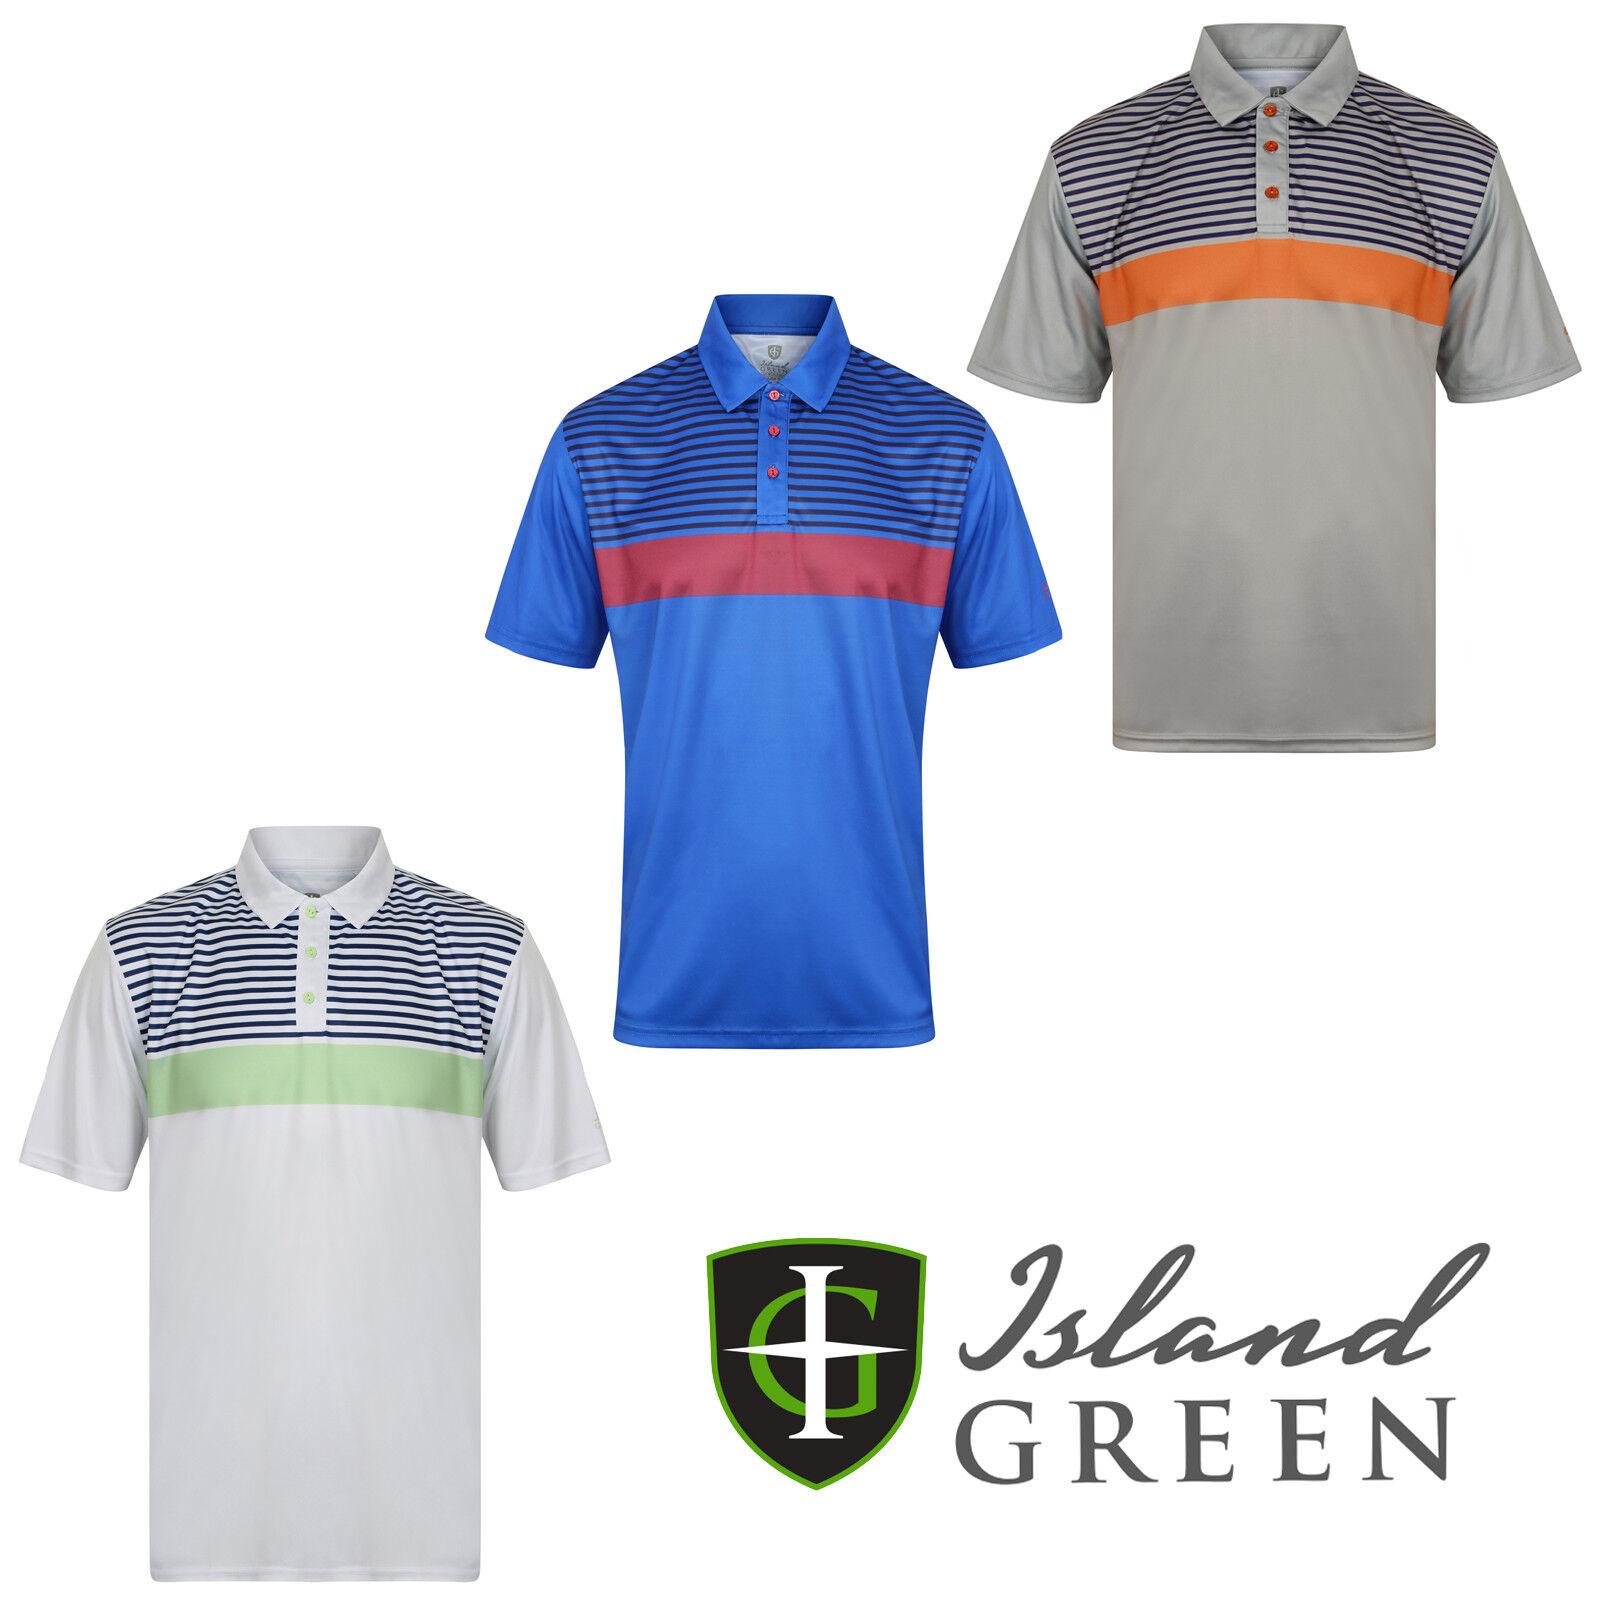 Island Green Mens Golf Polo Shirts Striped Short Sleeve Casual Shirt